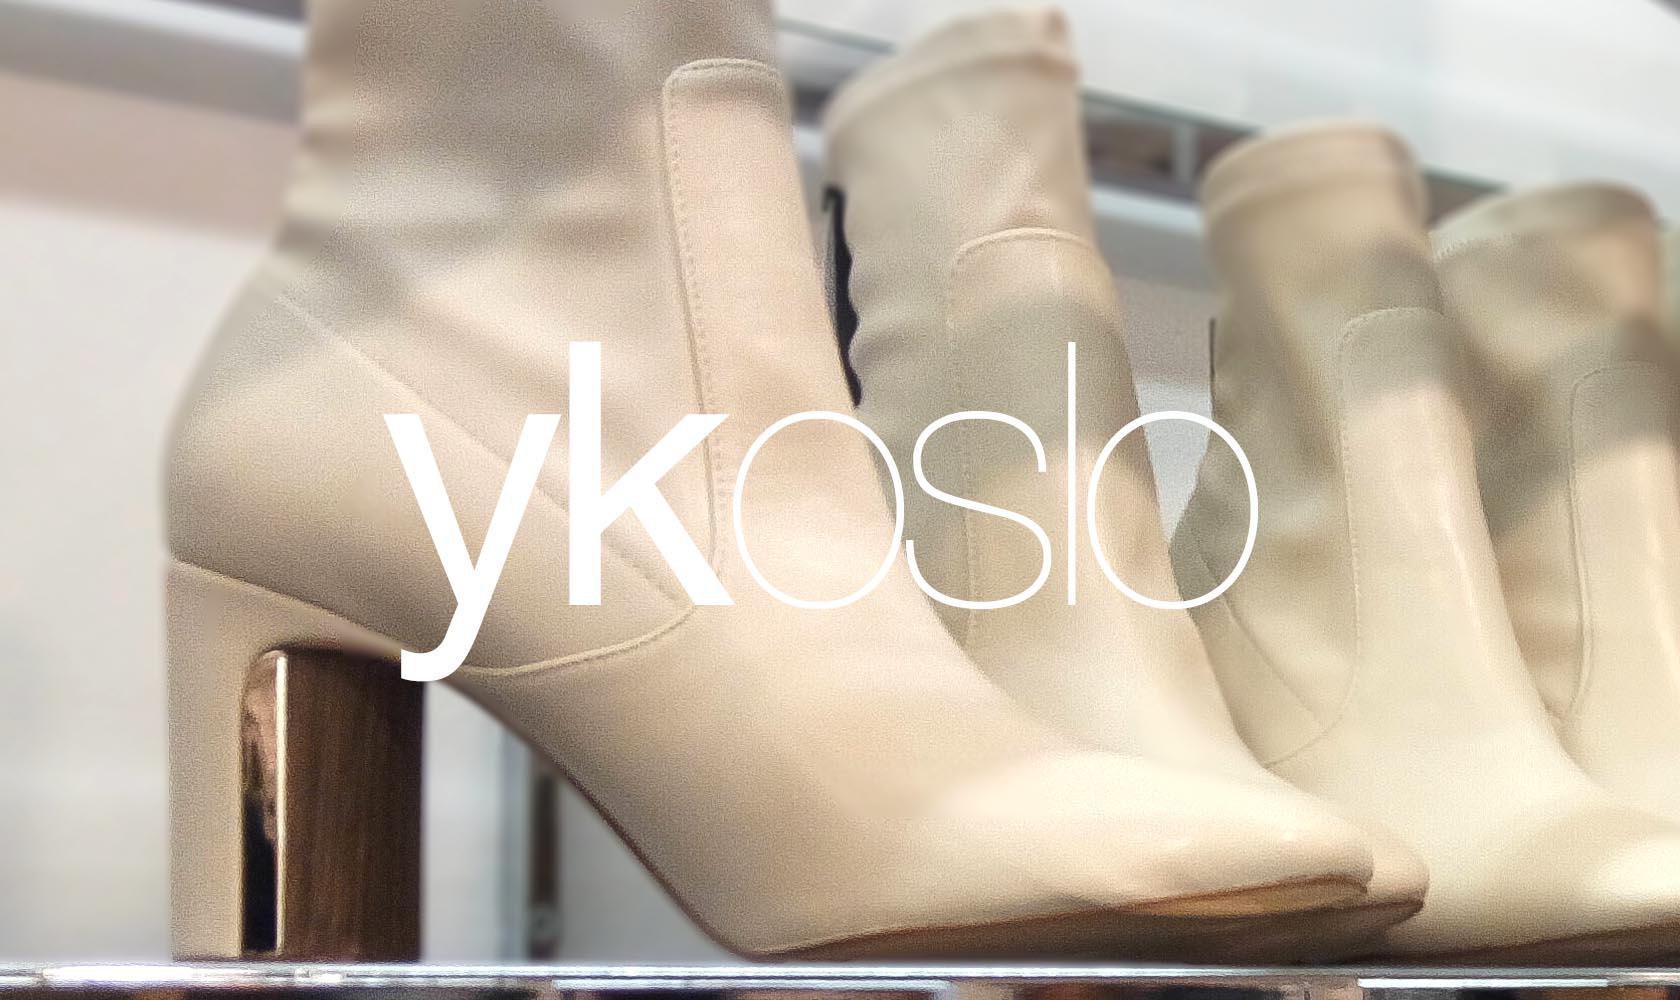 ykoslo__2